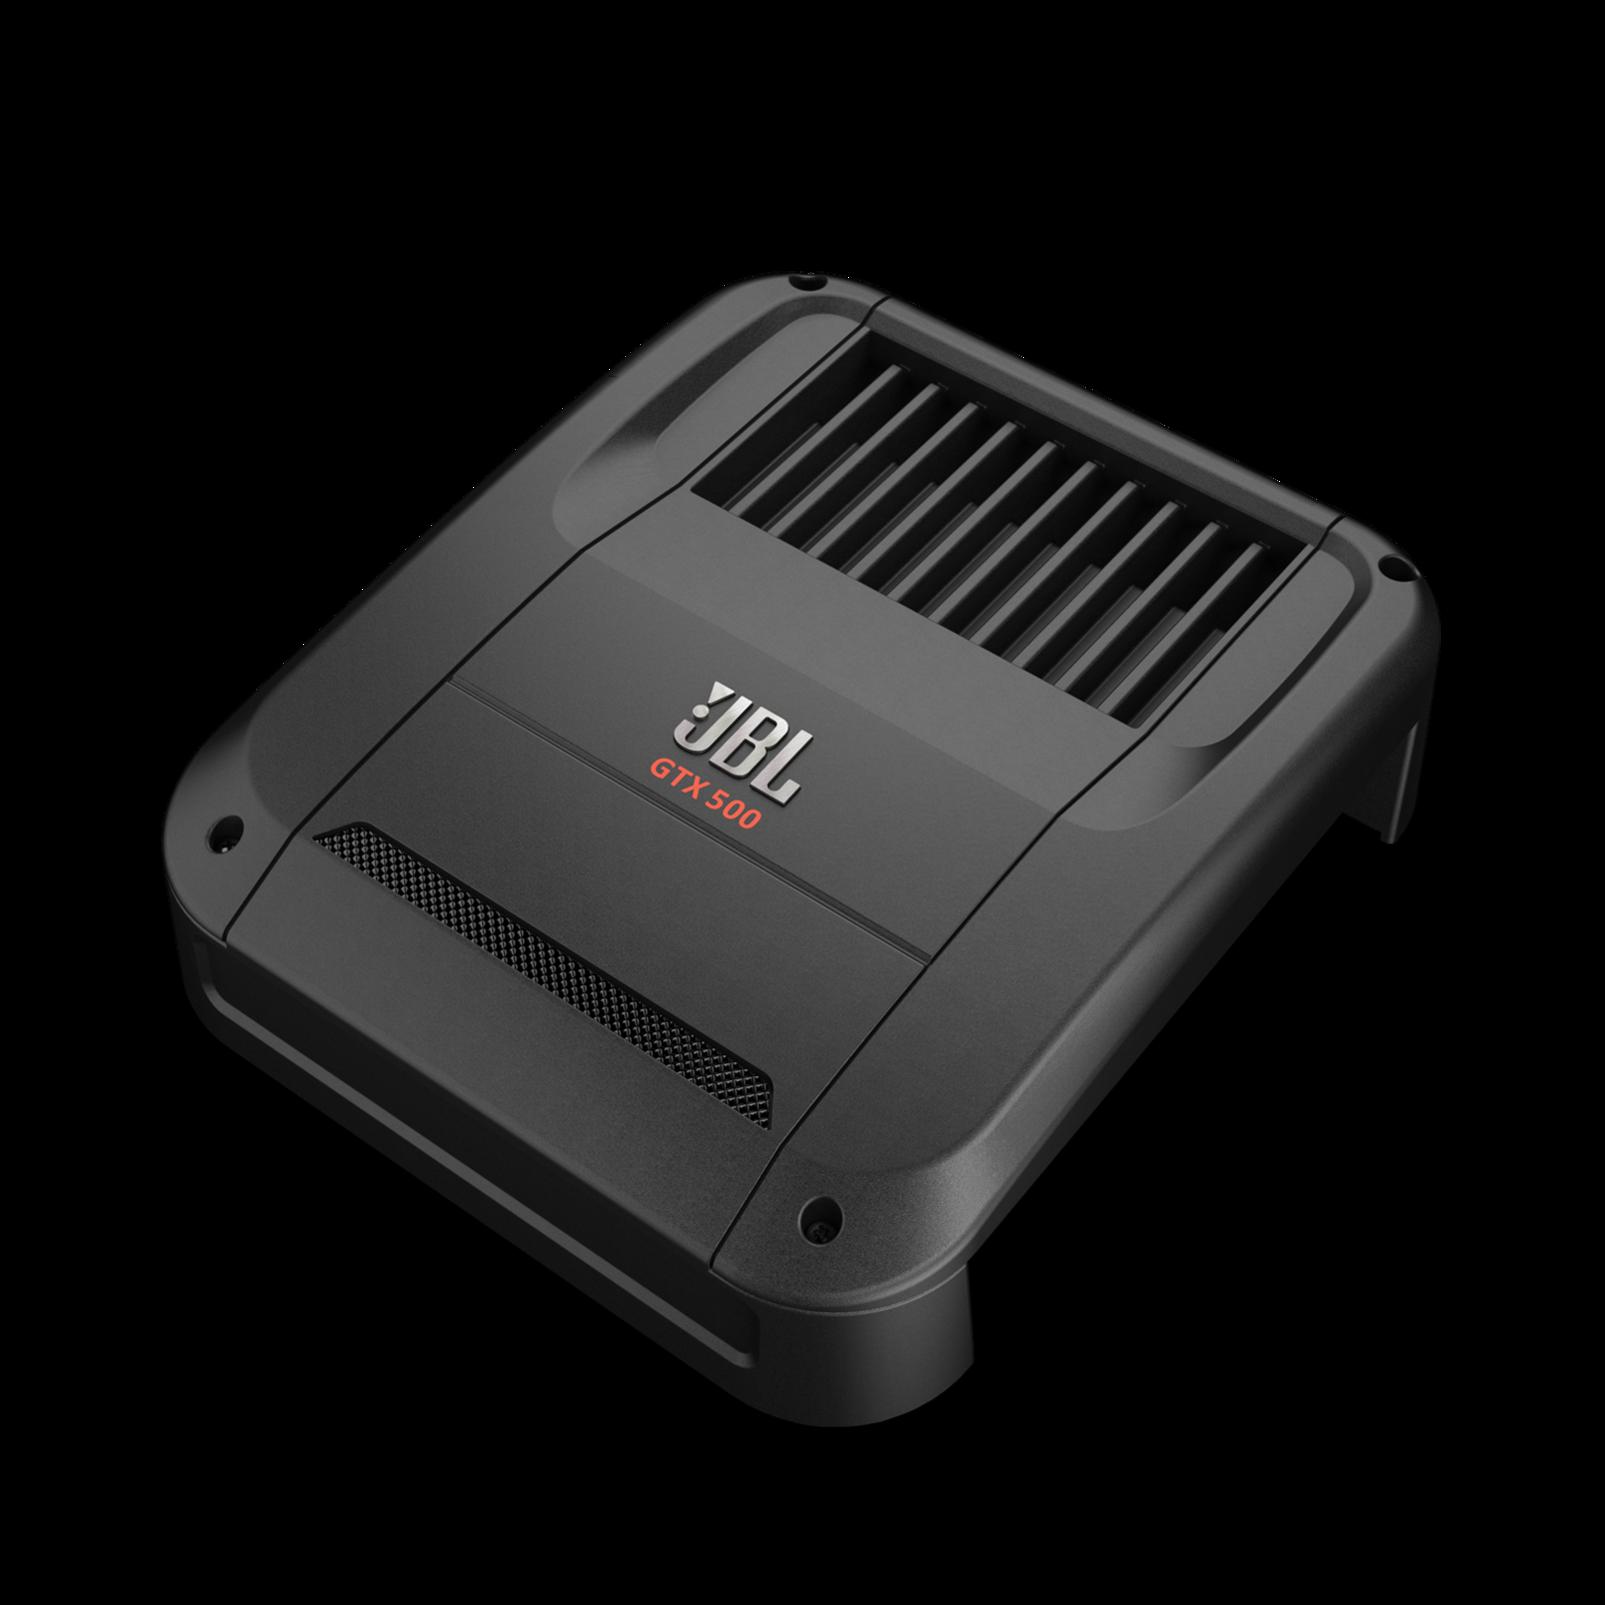 GTX 500 Refurbished 750 Watt Mono Subwoofer Car Amplifier $79.99 + Free Shipping